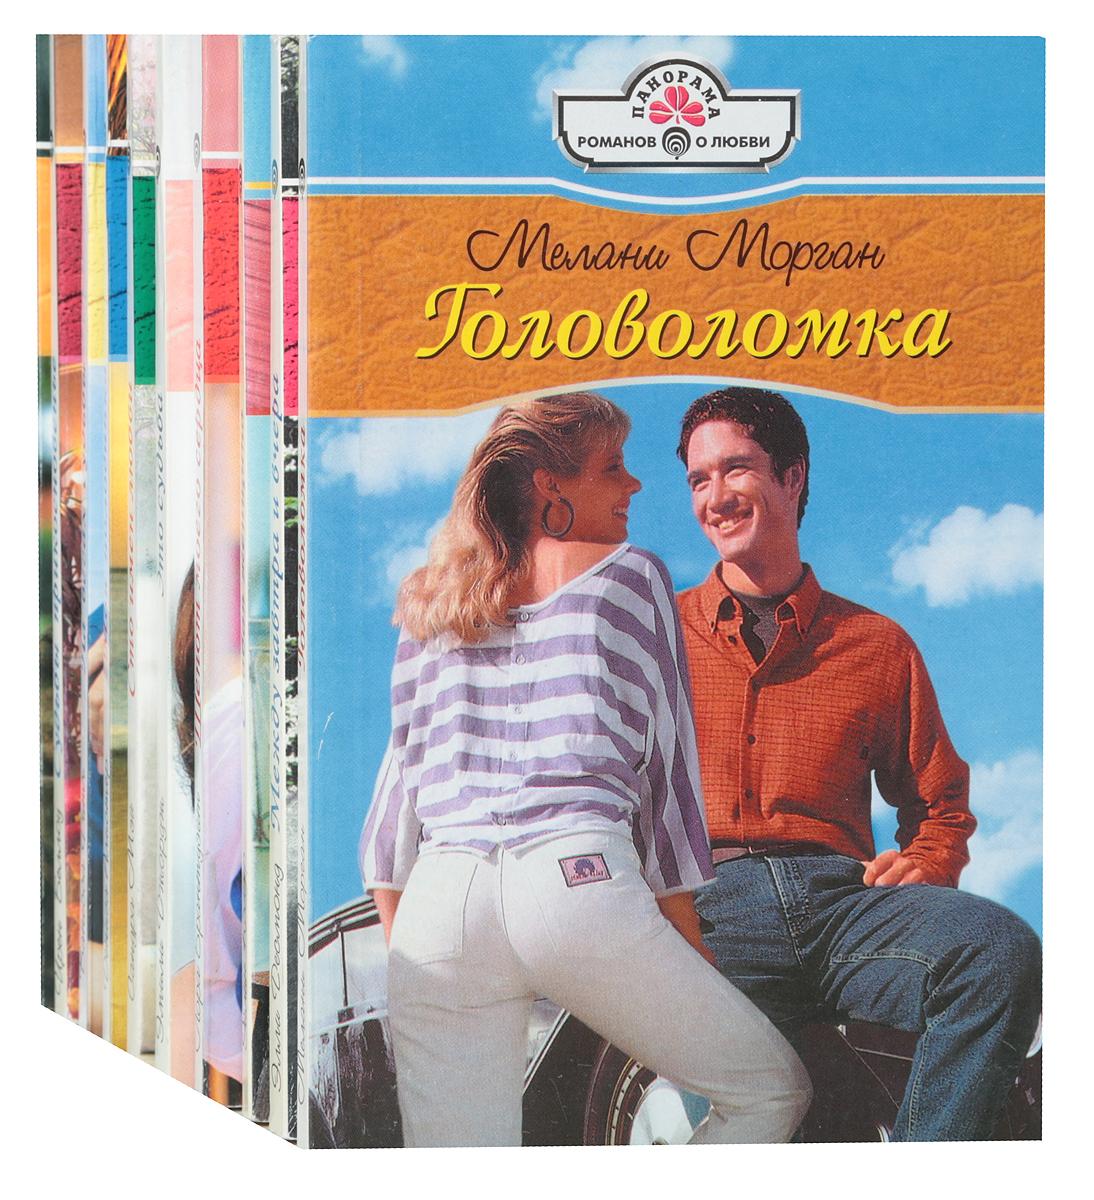 одно картинки книг панорама романов о любви квартира-студия